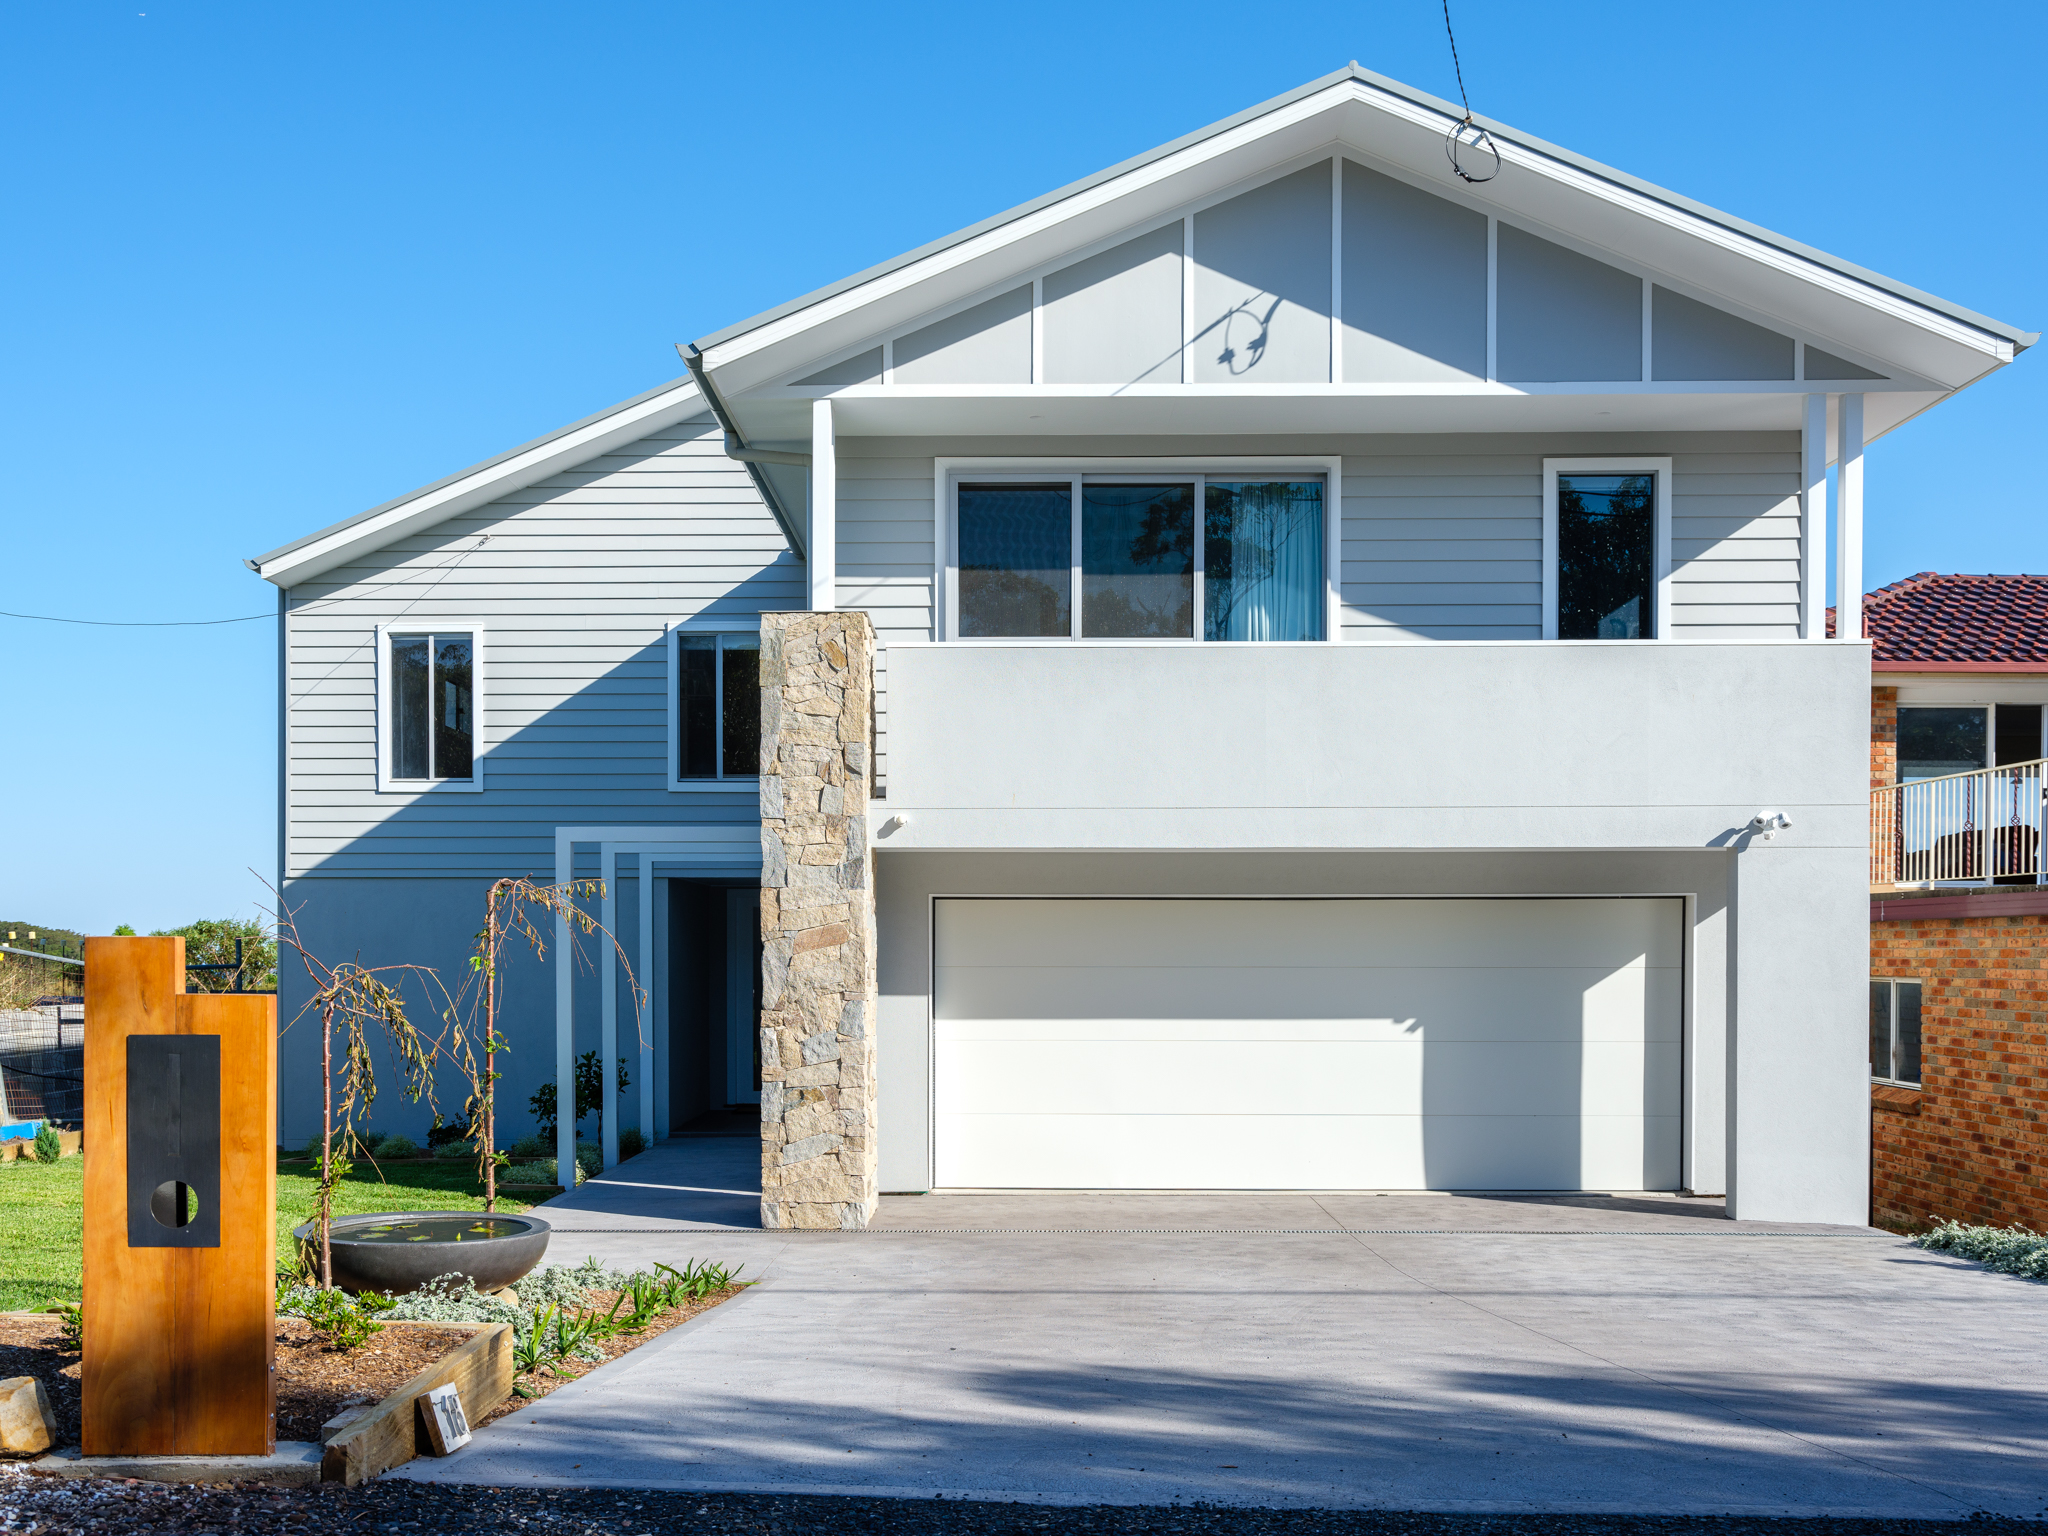 architect sydney central coast architecture residentaial design 04 .jpg